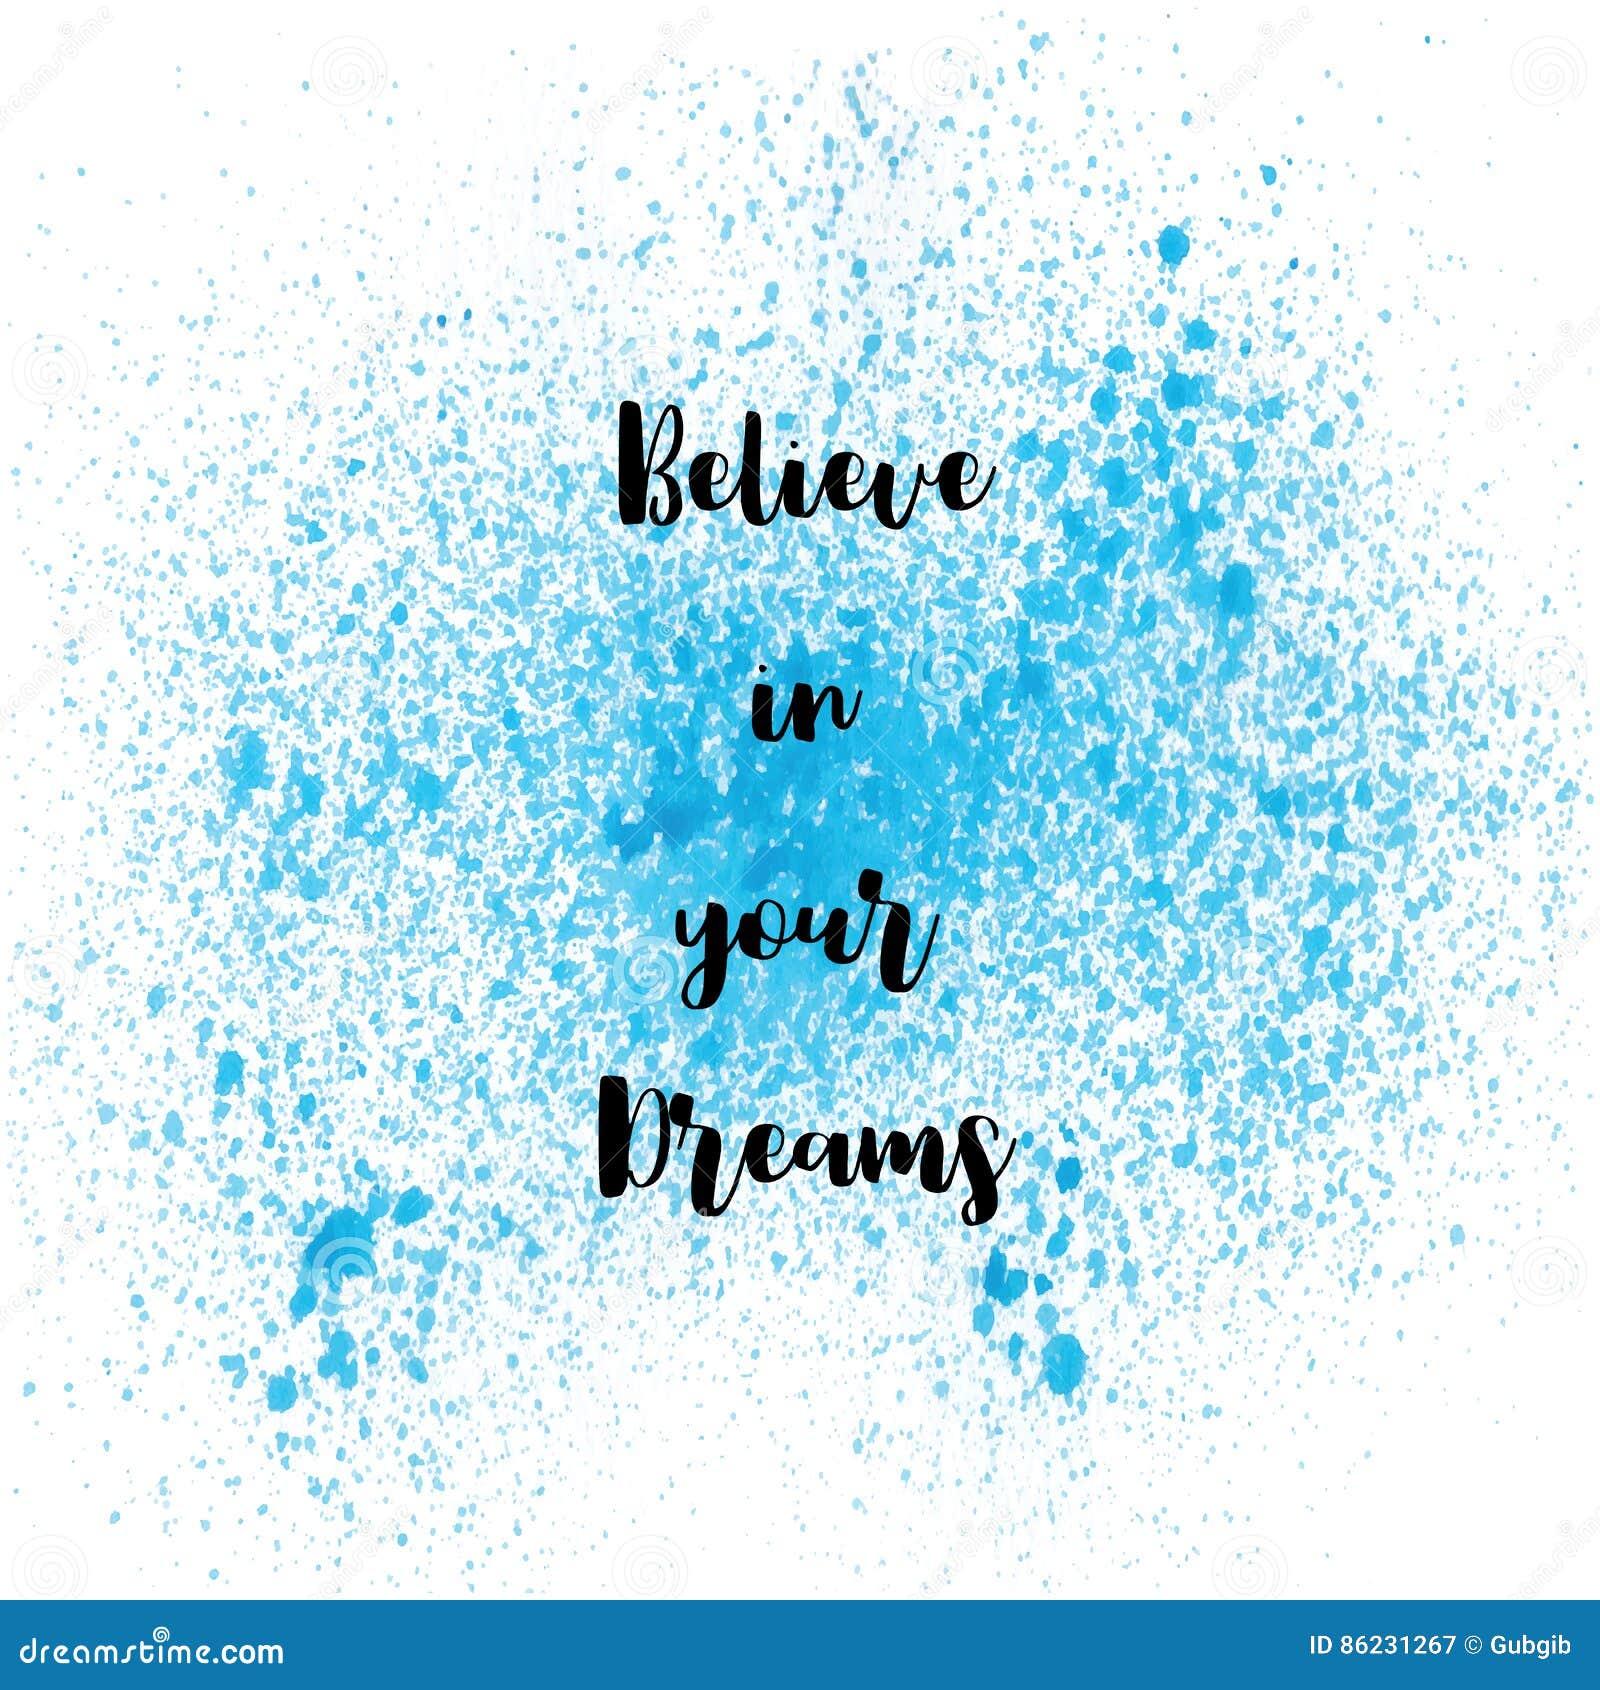 royaltyfree download believe in your dreams on blue spray paint